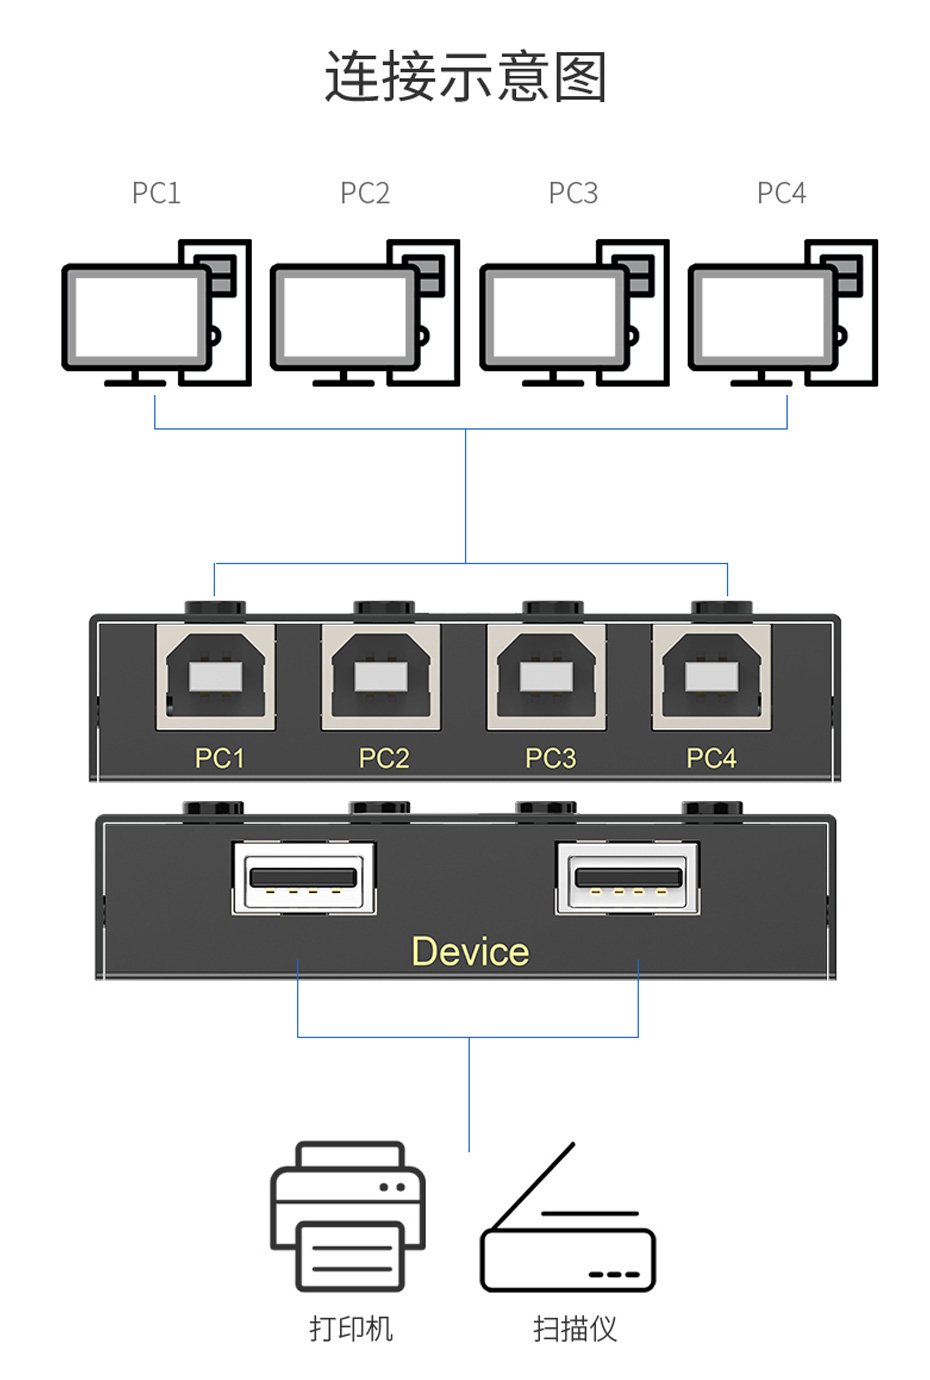 USB2.0打印机共享器4进2出04U连接使用示意图